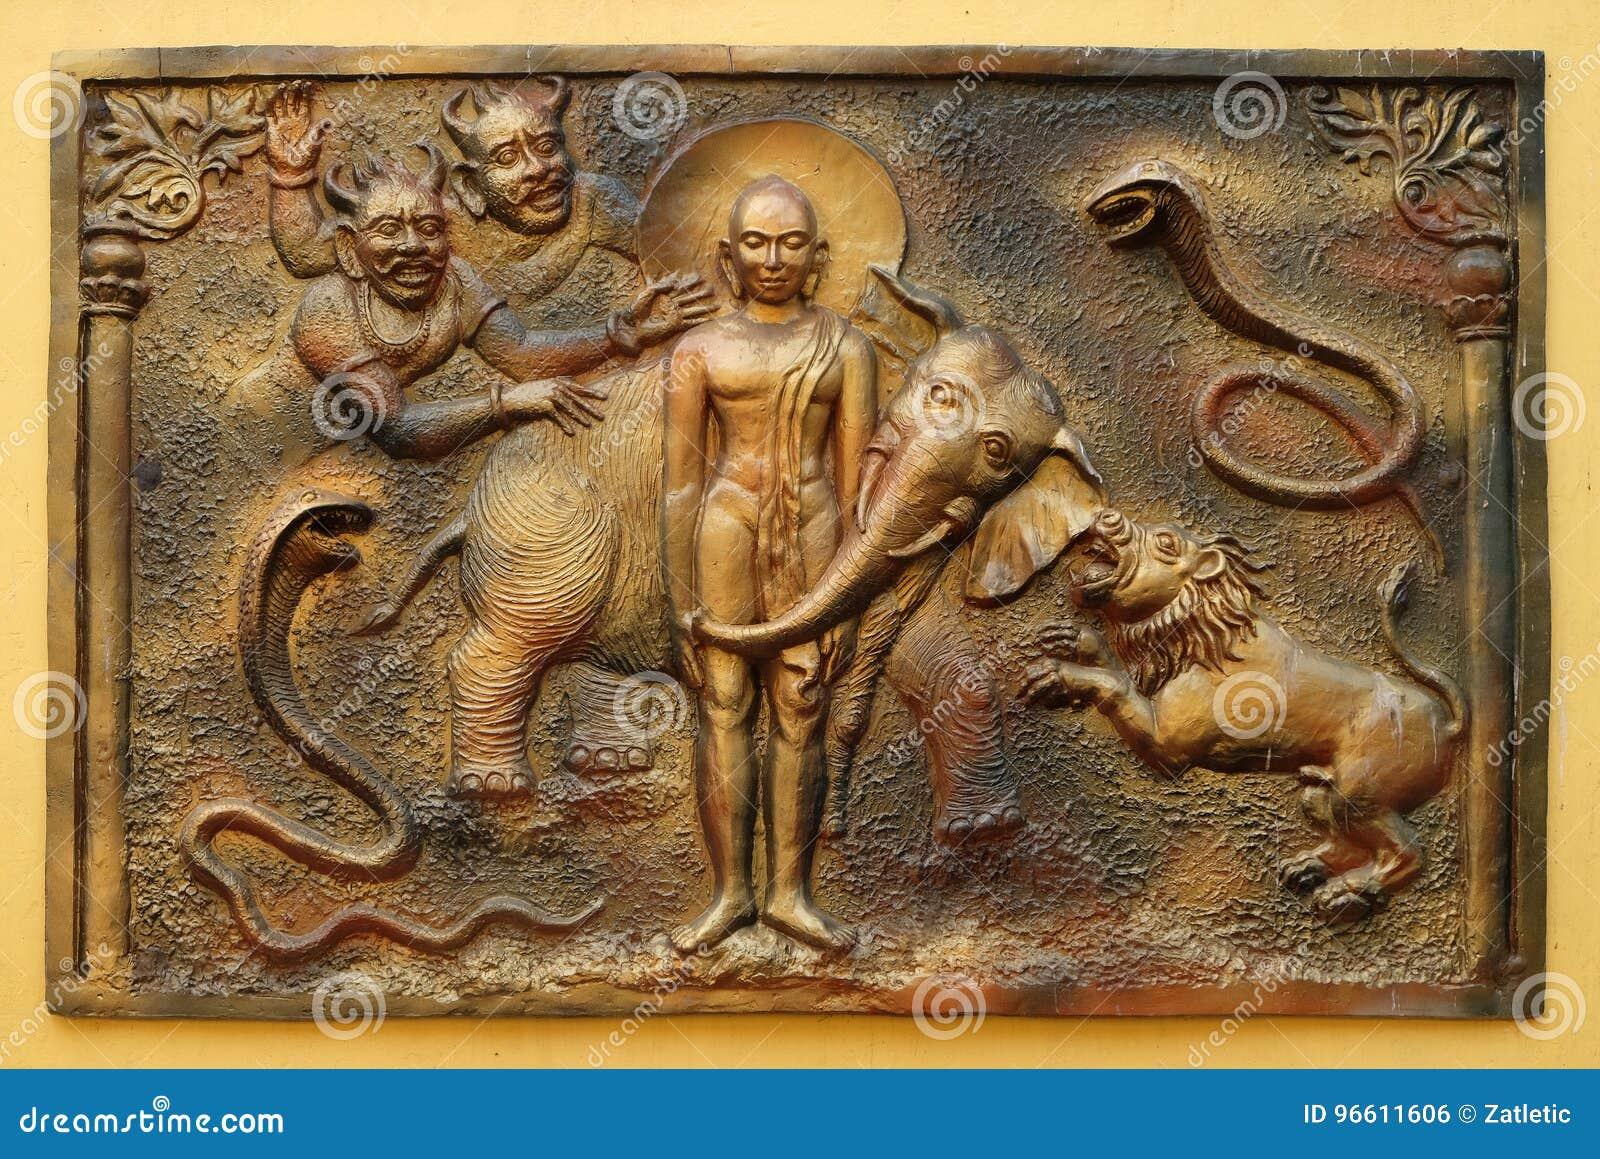 Le Yaksa Sulapani essaye d harceler Bhagavan Mahavira tandis qu absorbé dans la méditation profonde